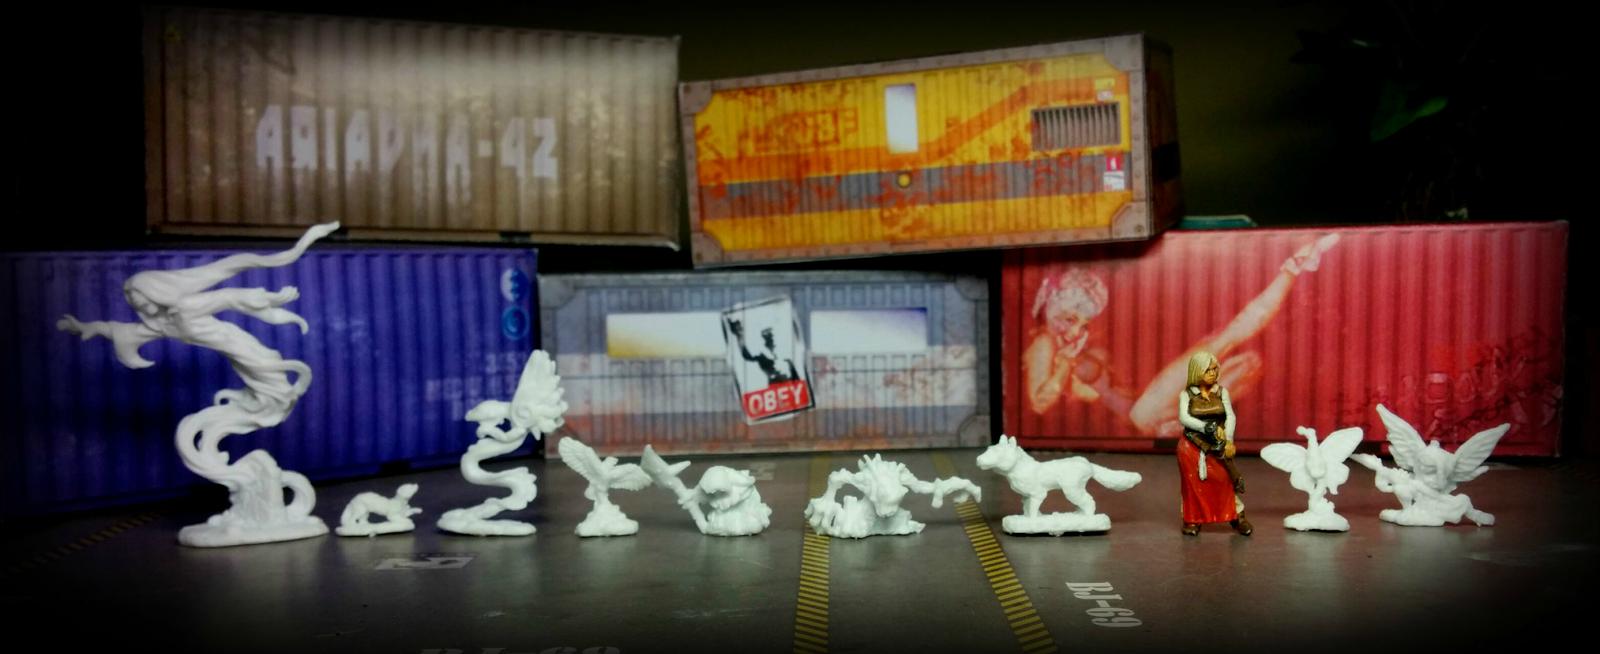 Ghost, Familiars - Reaper Bones, Alicia - Hasslefree Miniatures